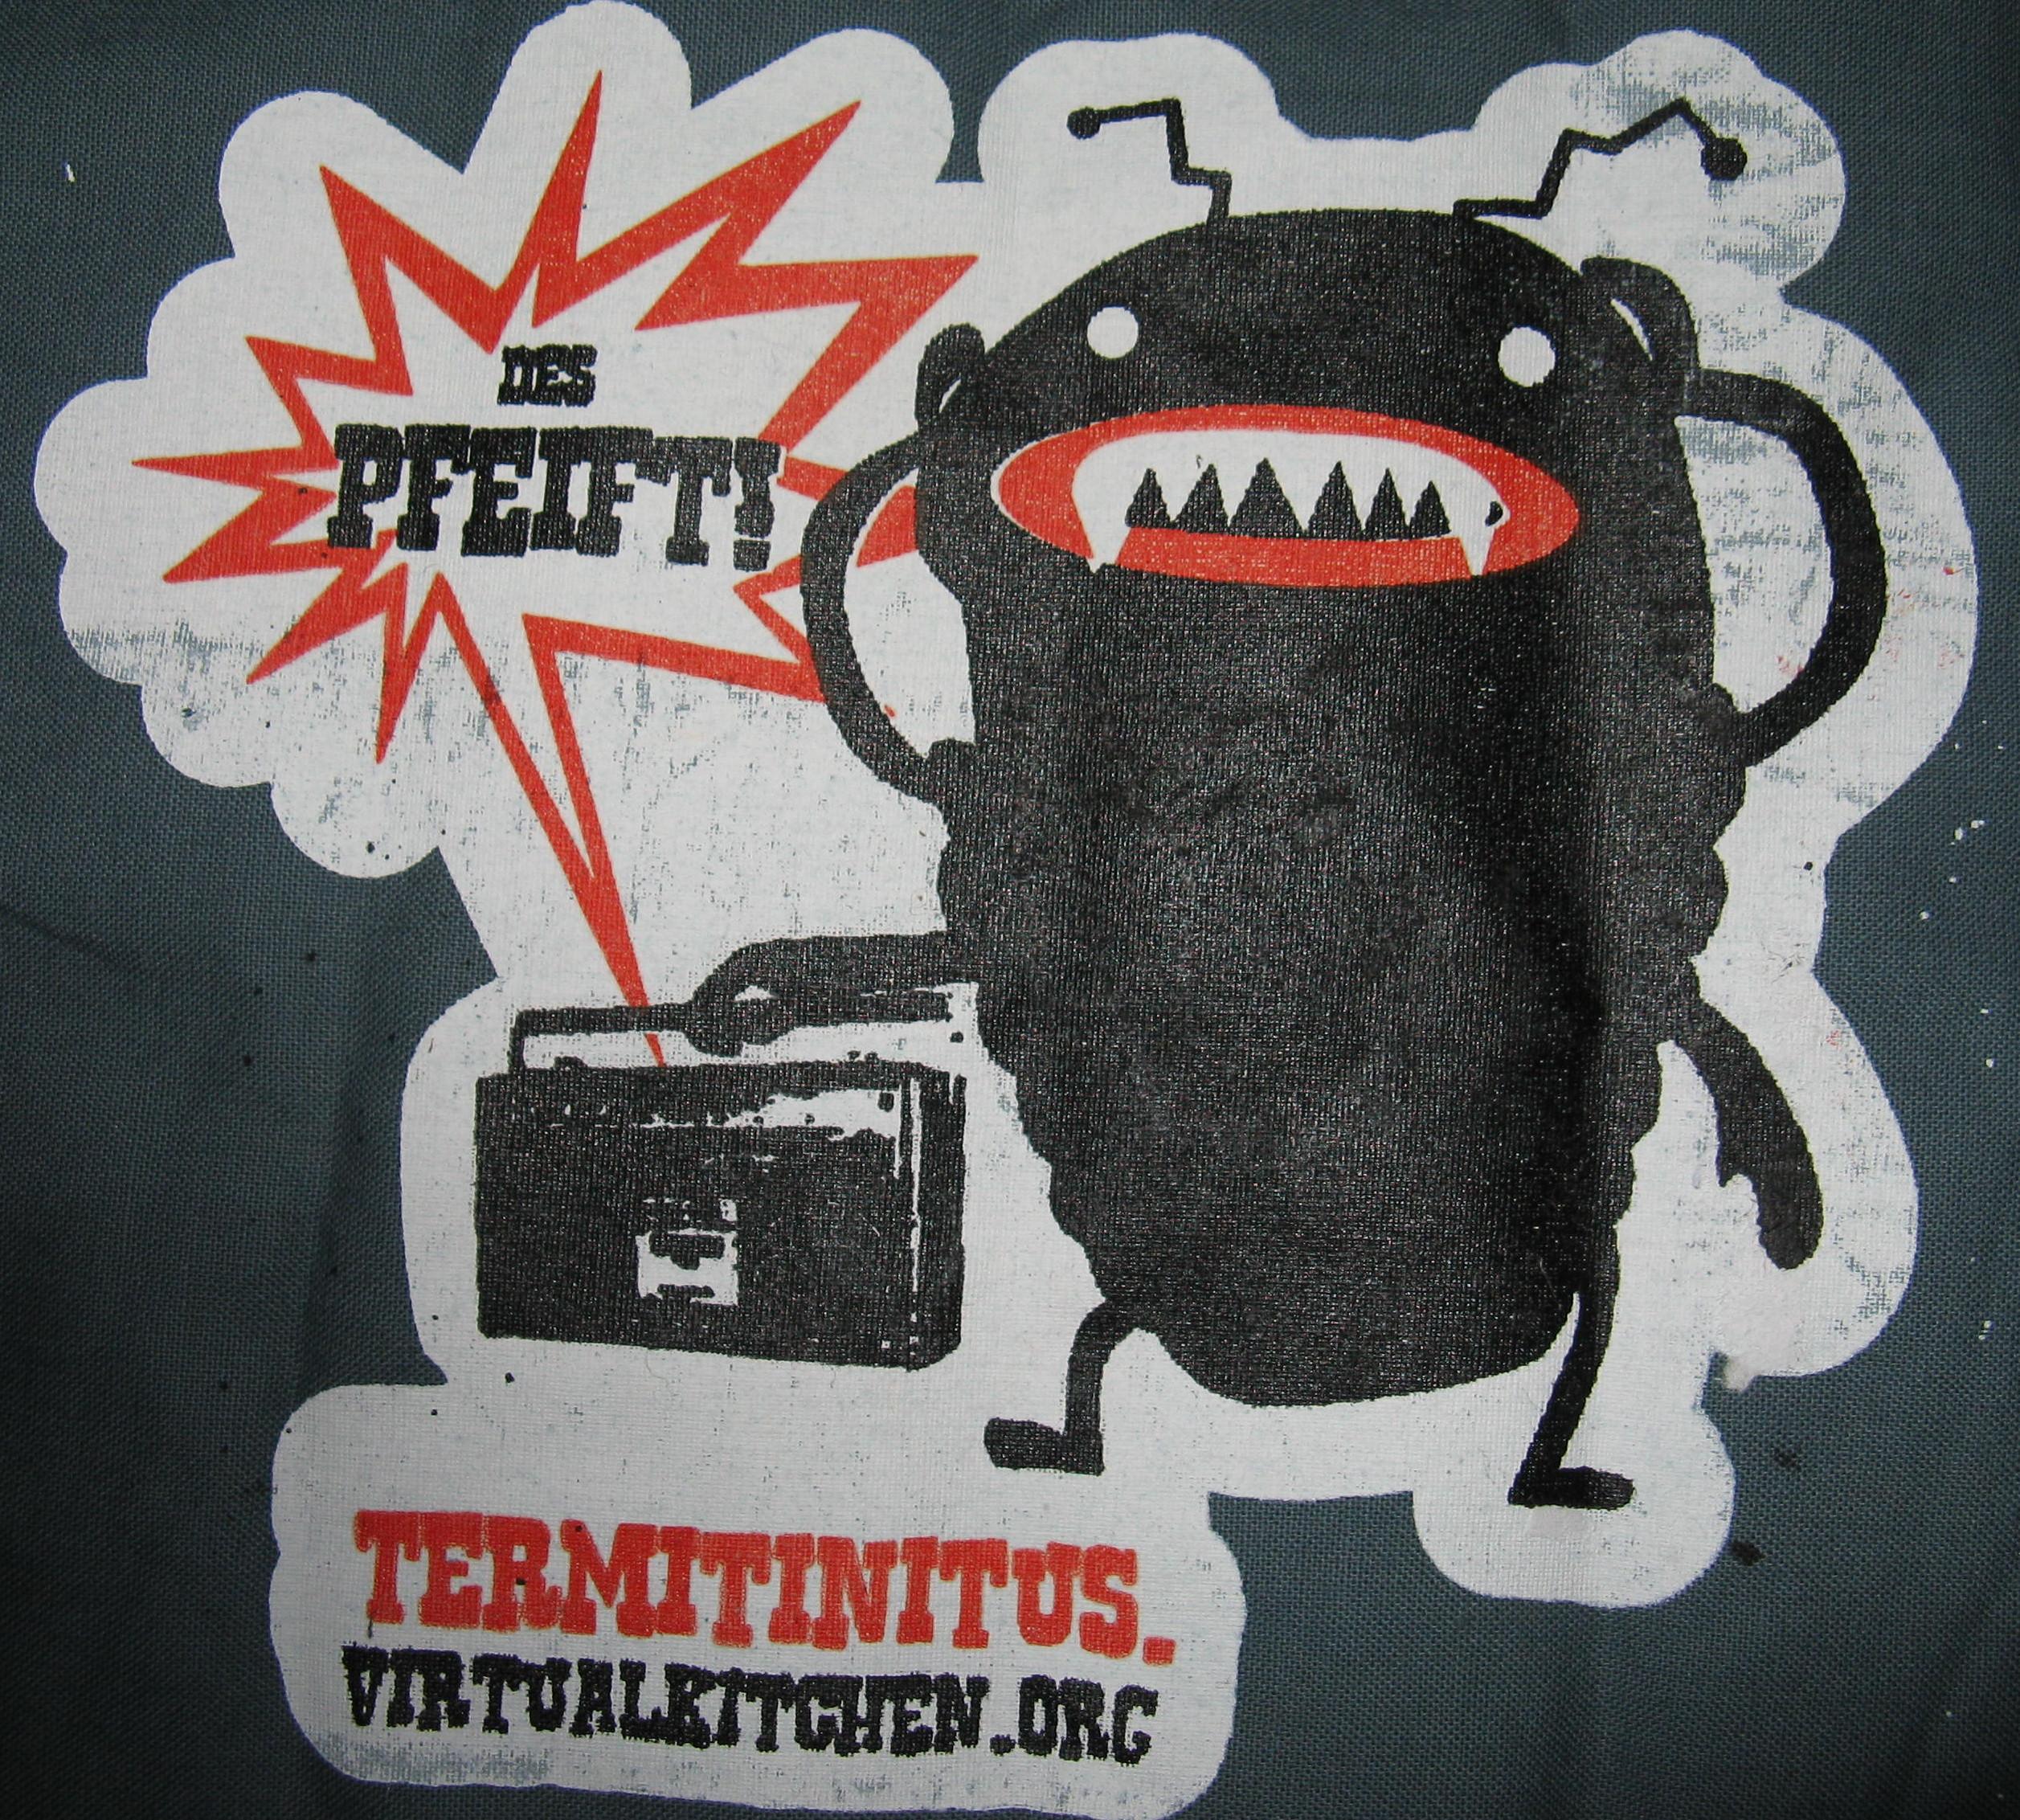 Schwarzer_Termitinitus